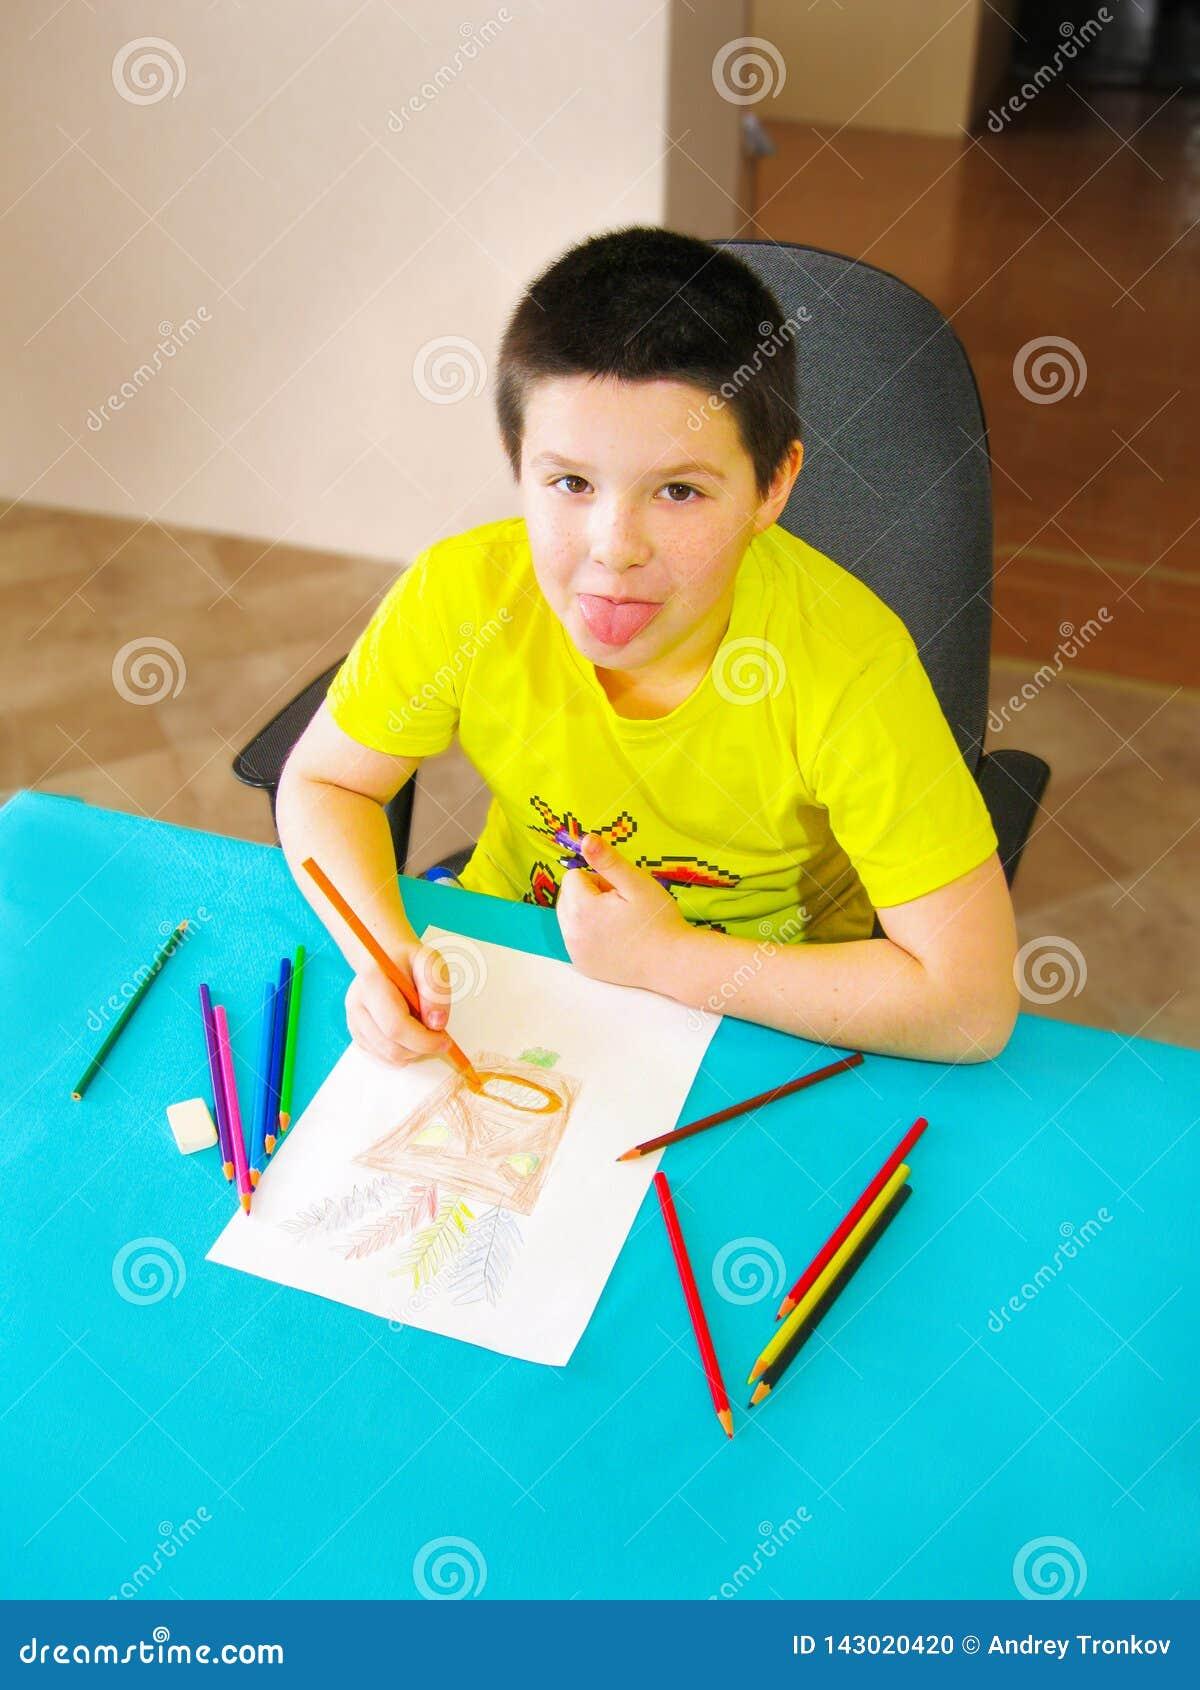 Mon fils dessine et barbote